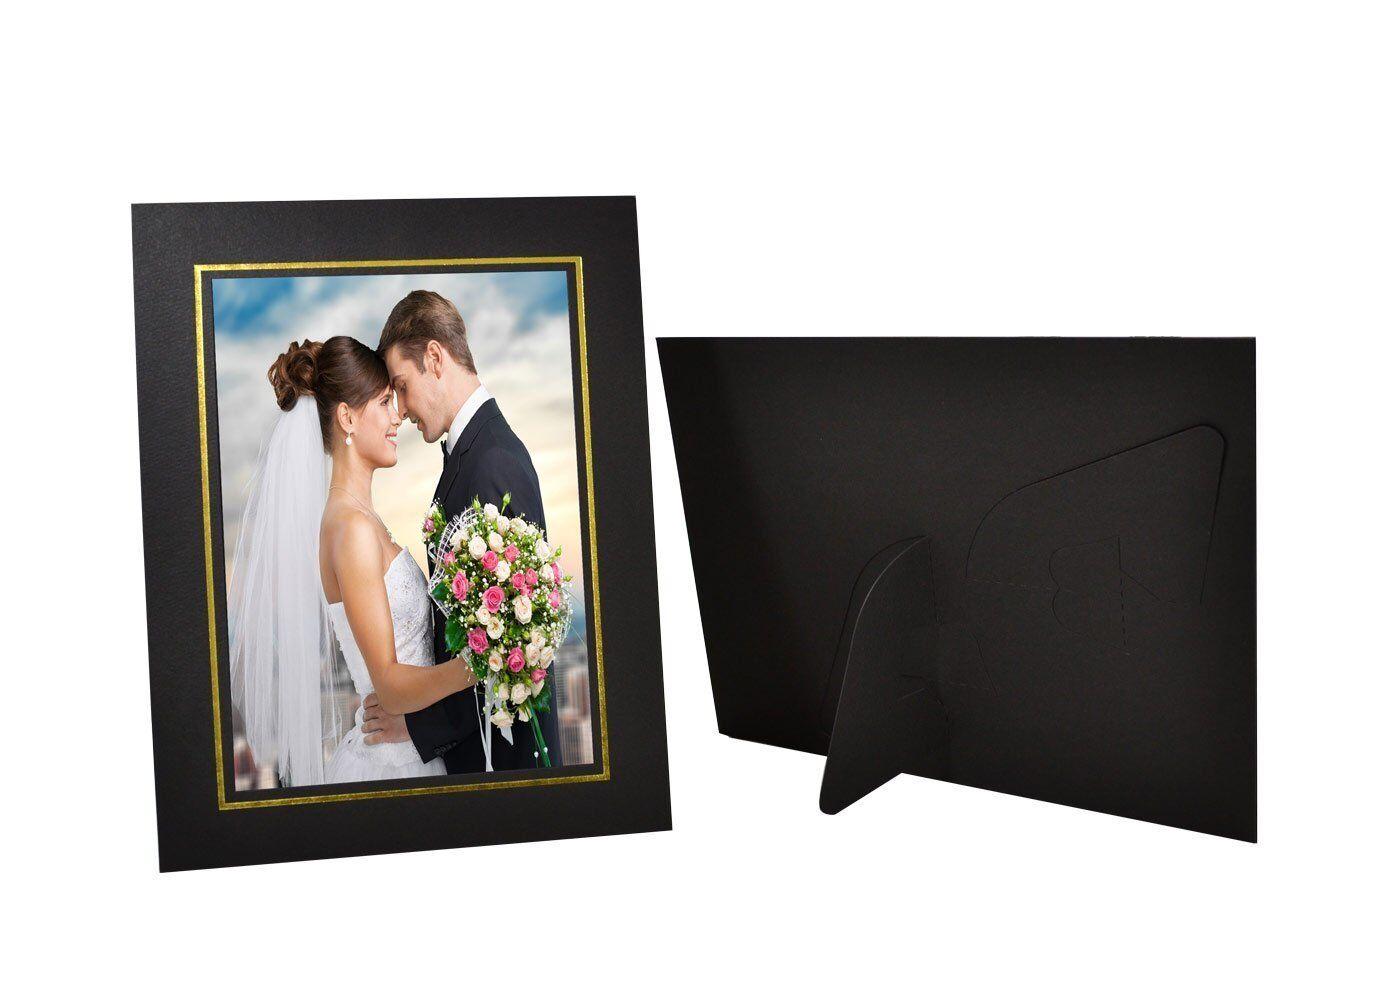 Cardboard easel photo frames